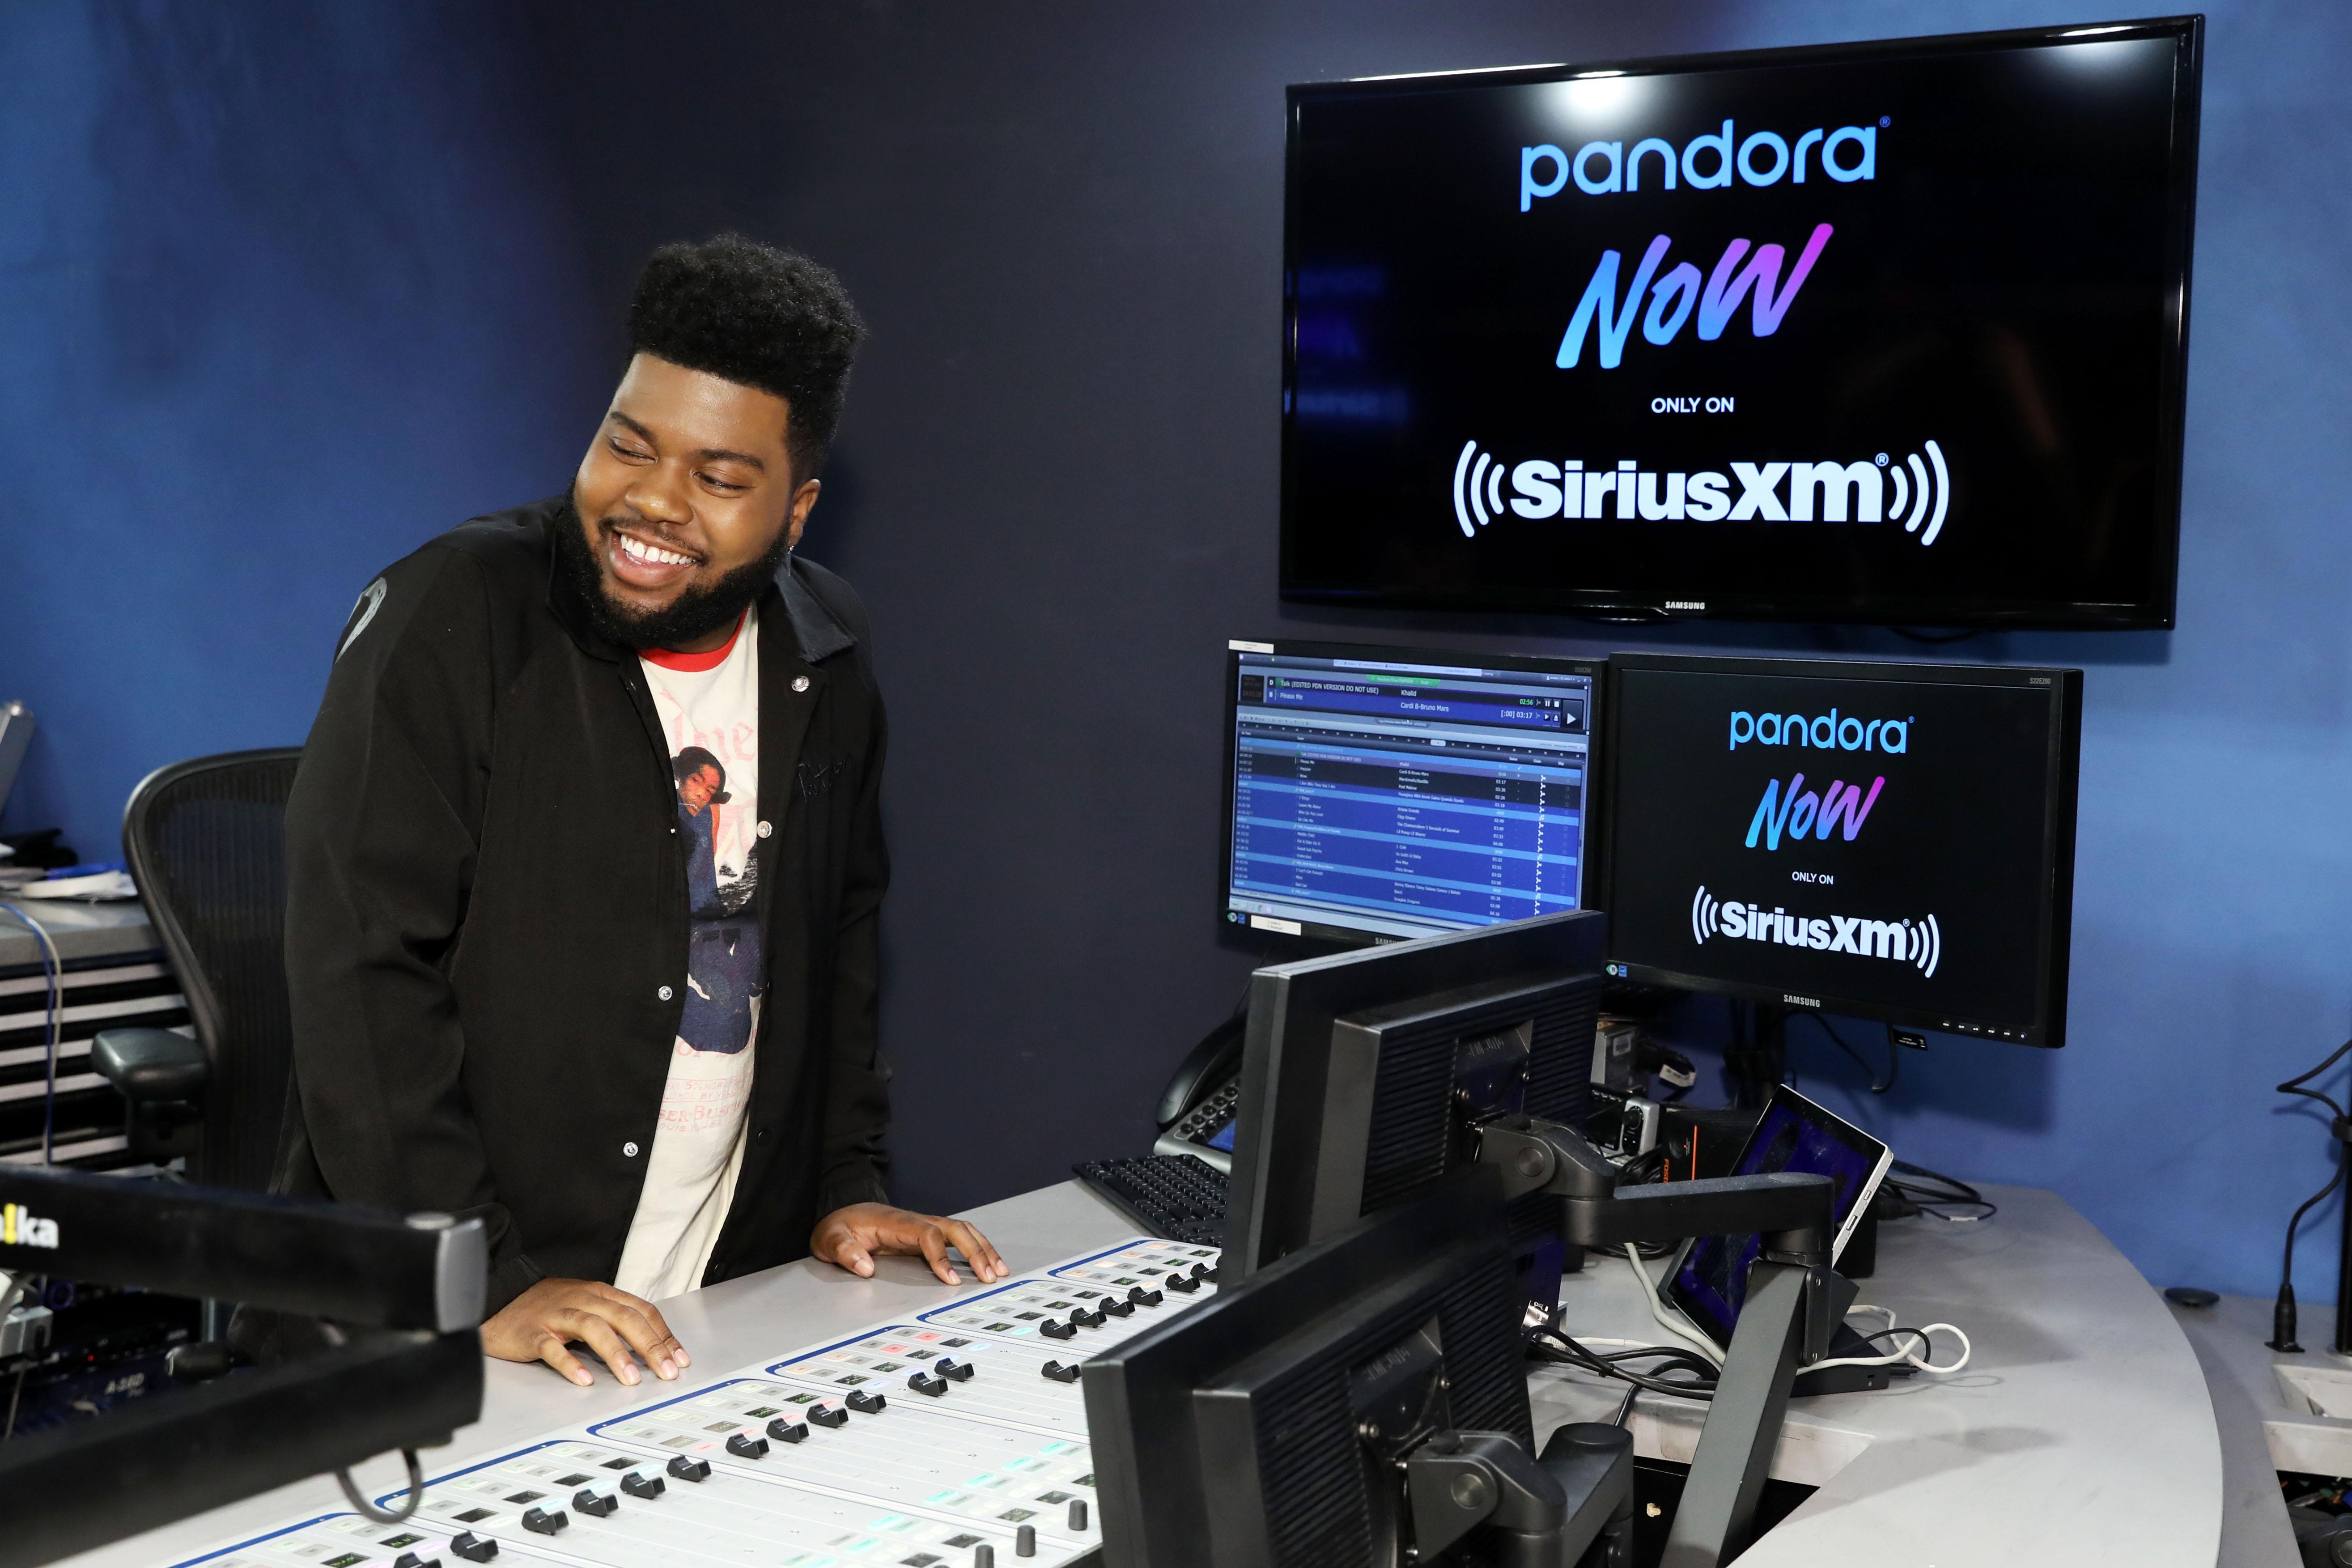 SiriusXM College Rate-Pandora-Khalid